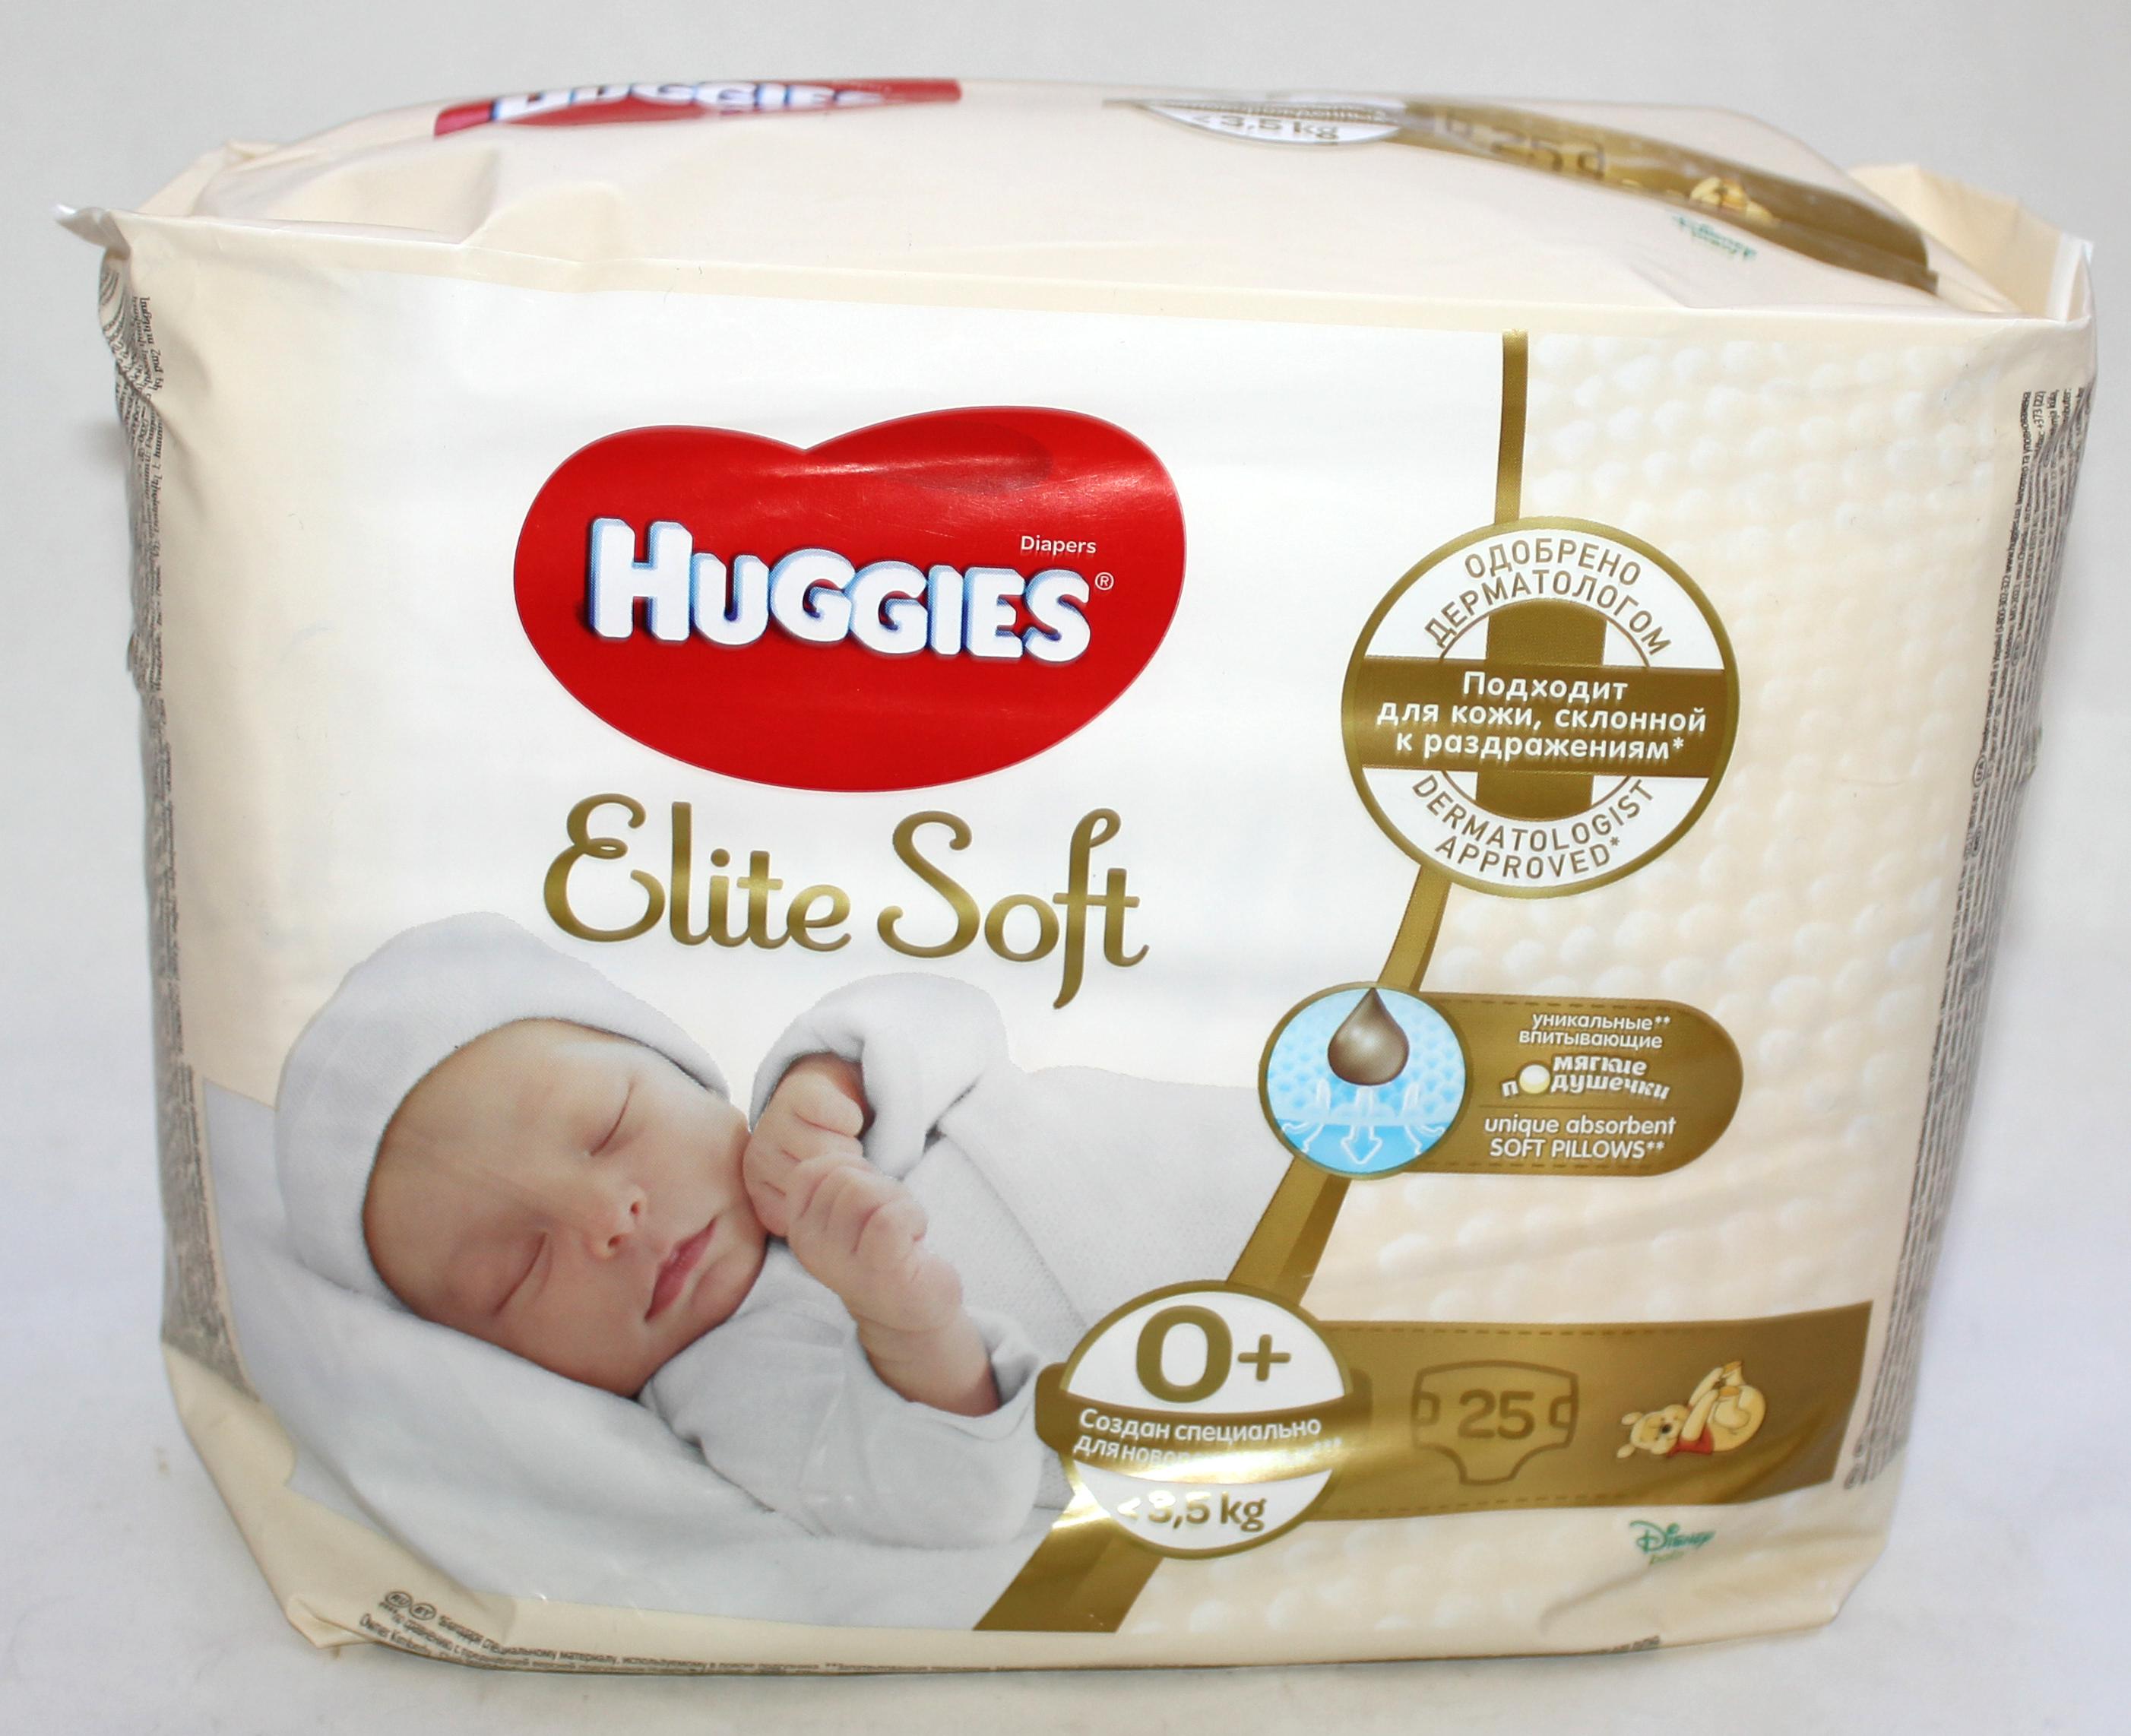 HUGGIES - ПОДГУЗНИКИ HUGGIES ELITE SOFT S0 25шт 3,5кг 5029053548005